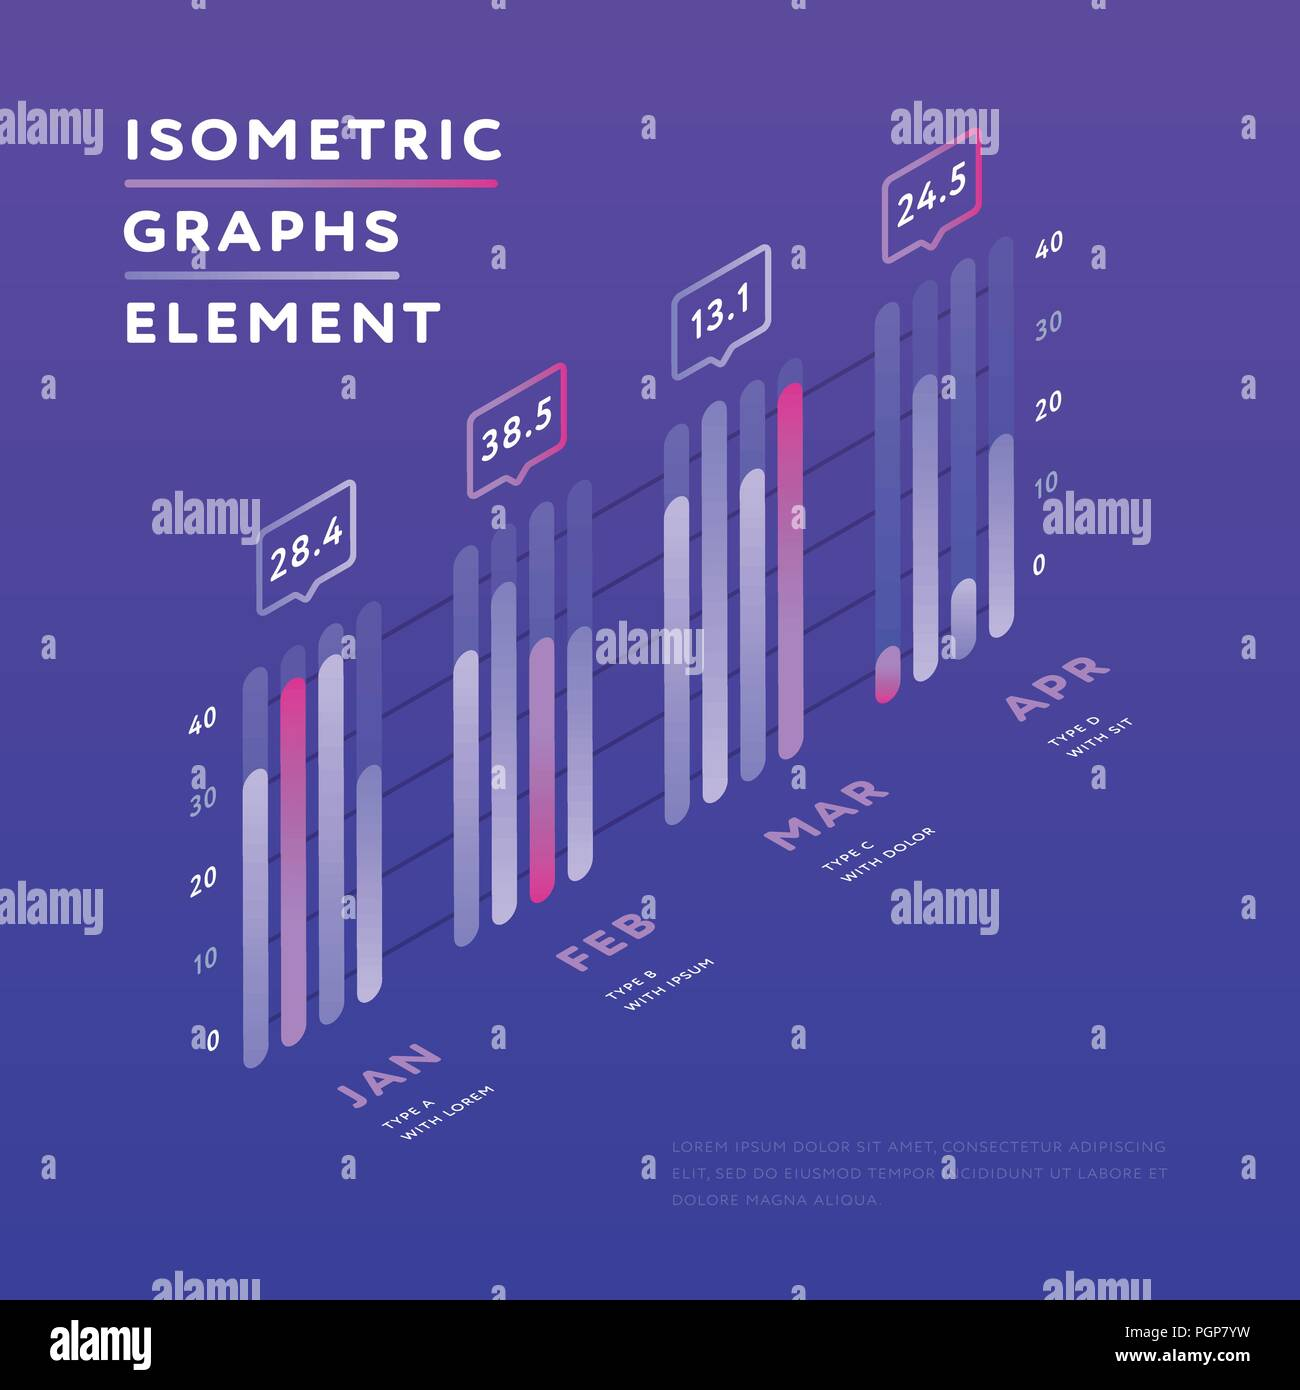 Isometric elements of graphic presentation  - Stock Image